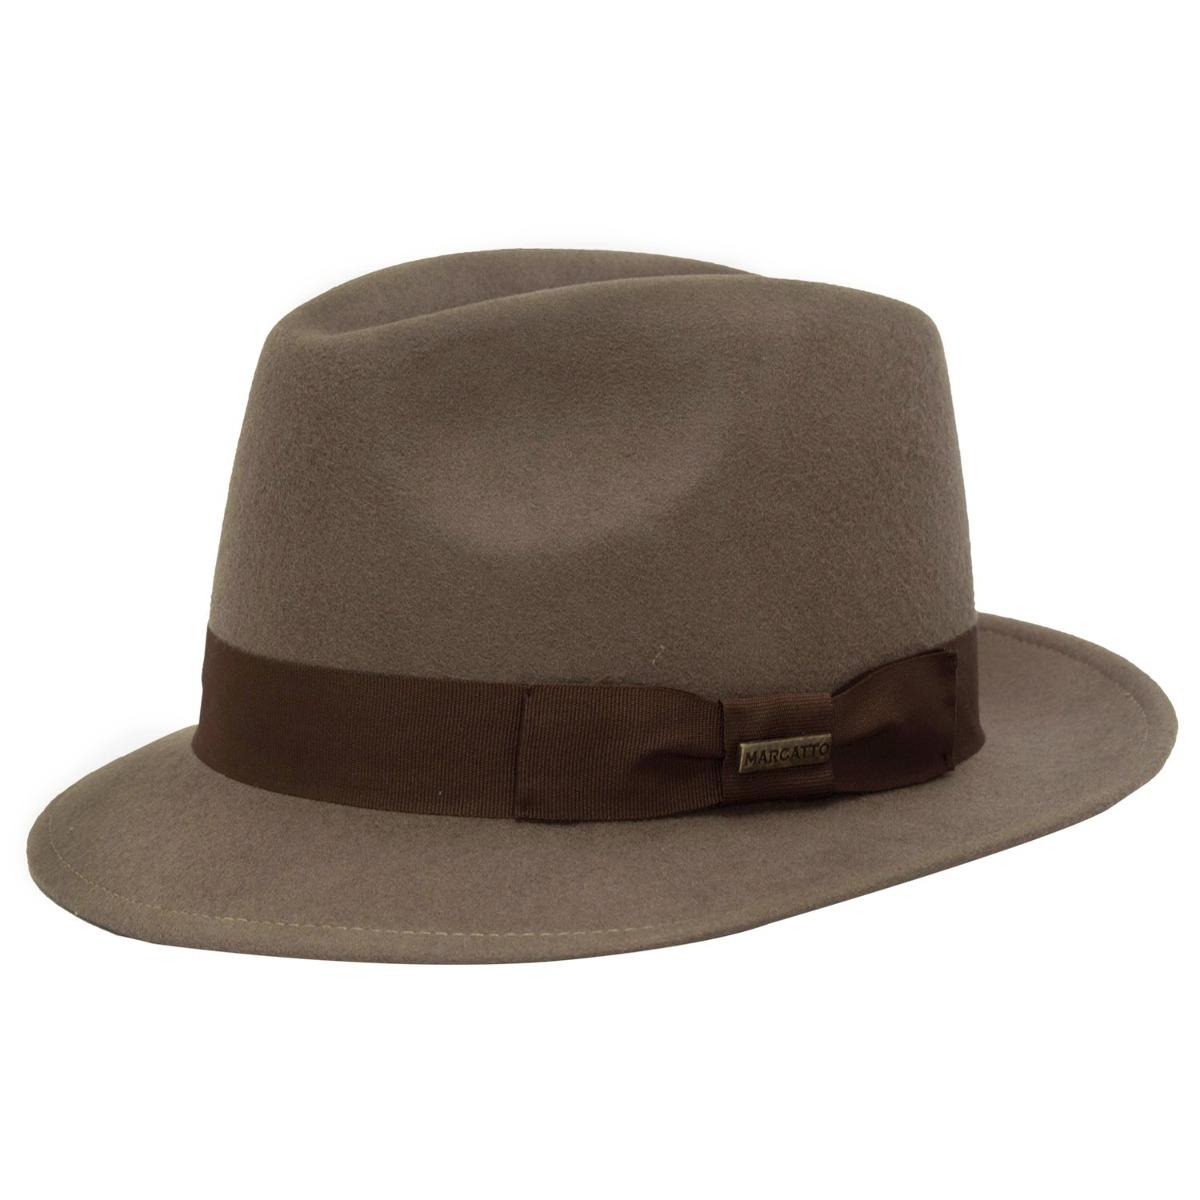 chapéu feminino masculino aba curta fedora borsalino marrom. Carregando  zoom. 2d0eb3da441